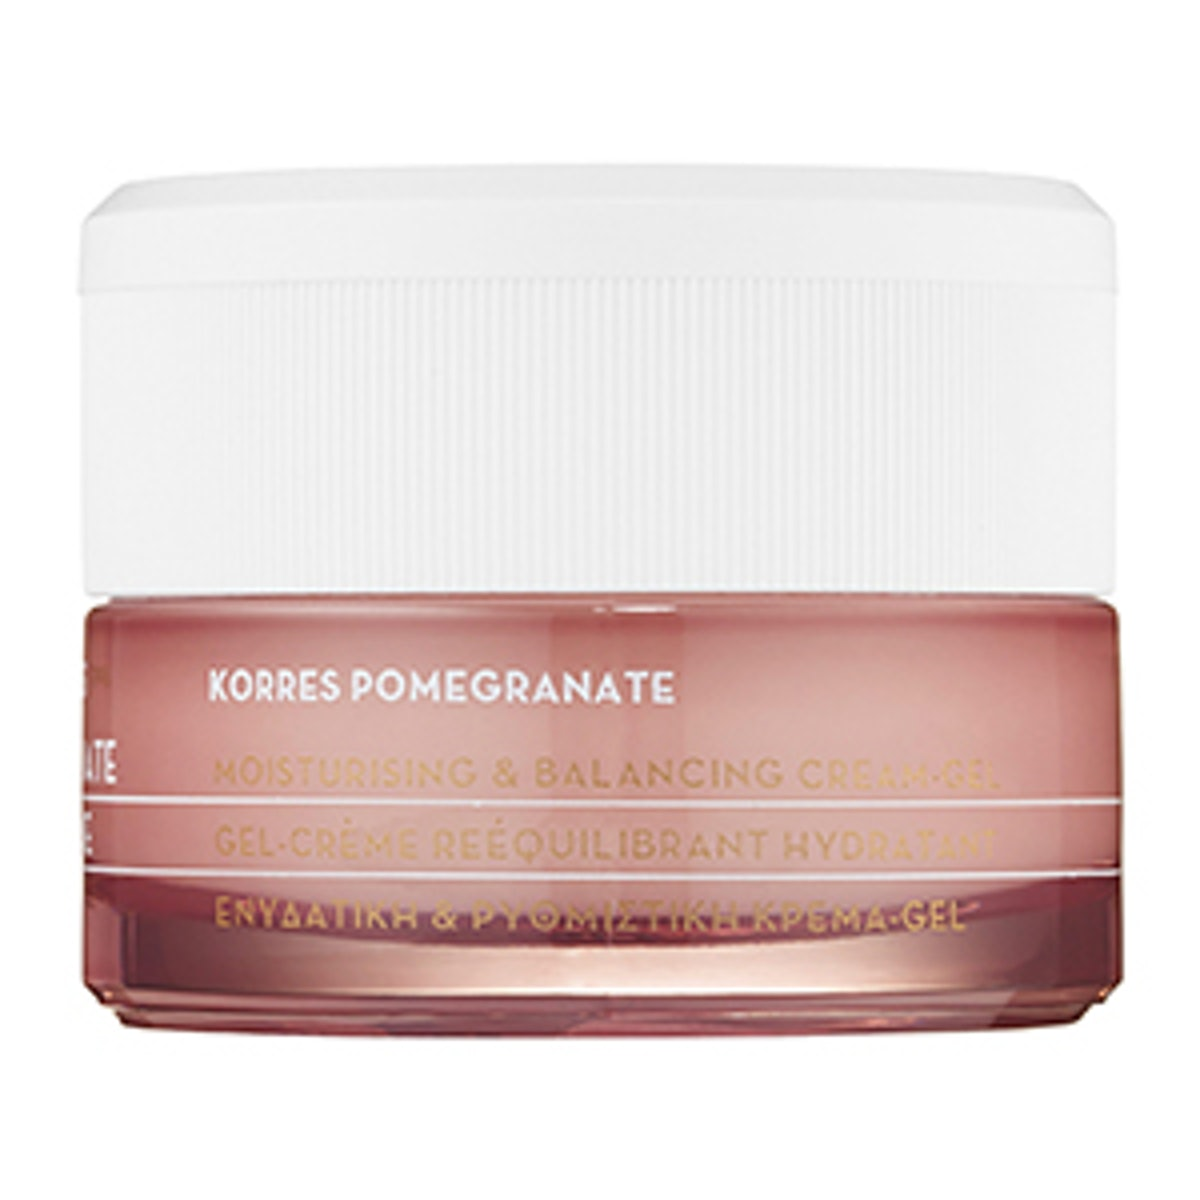 Pomegranate Balancing Cream-Gel Moisturizer